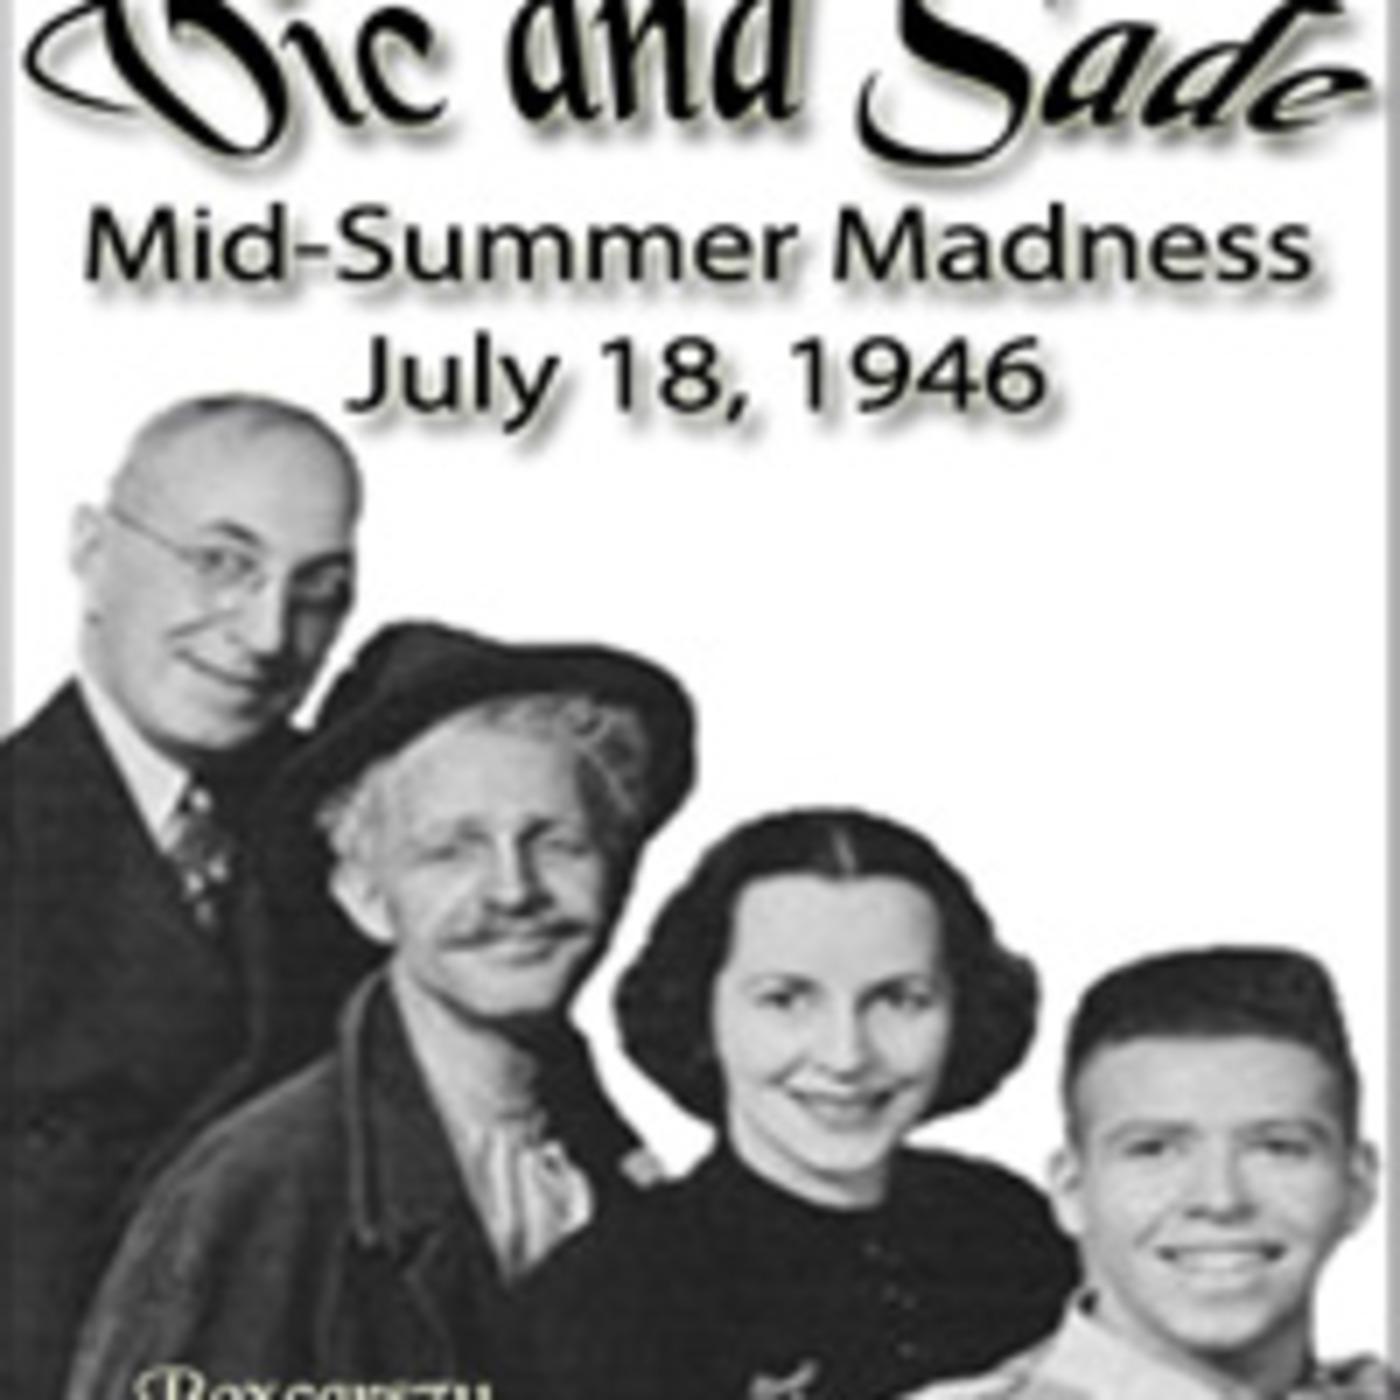 Vic & Sad - Mid-summer Madness (07-18-46)